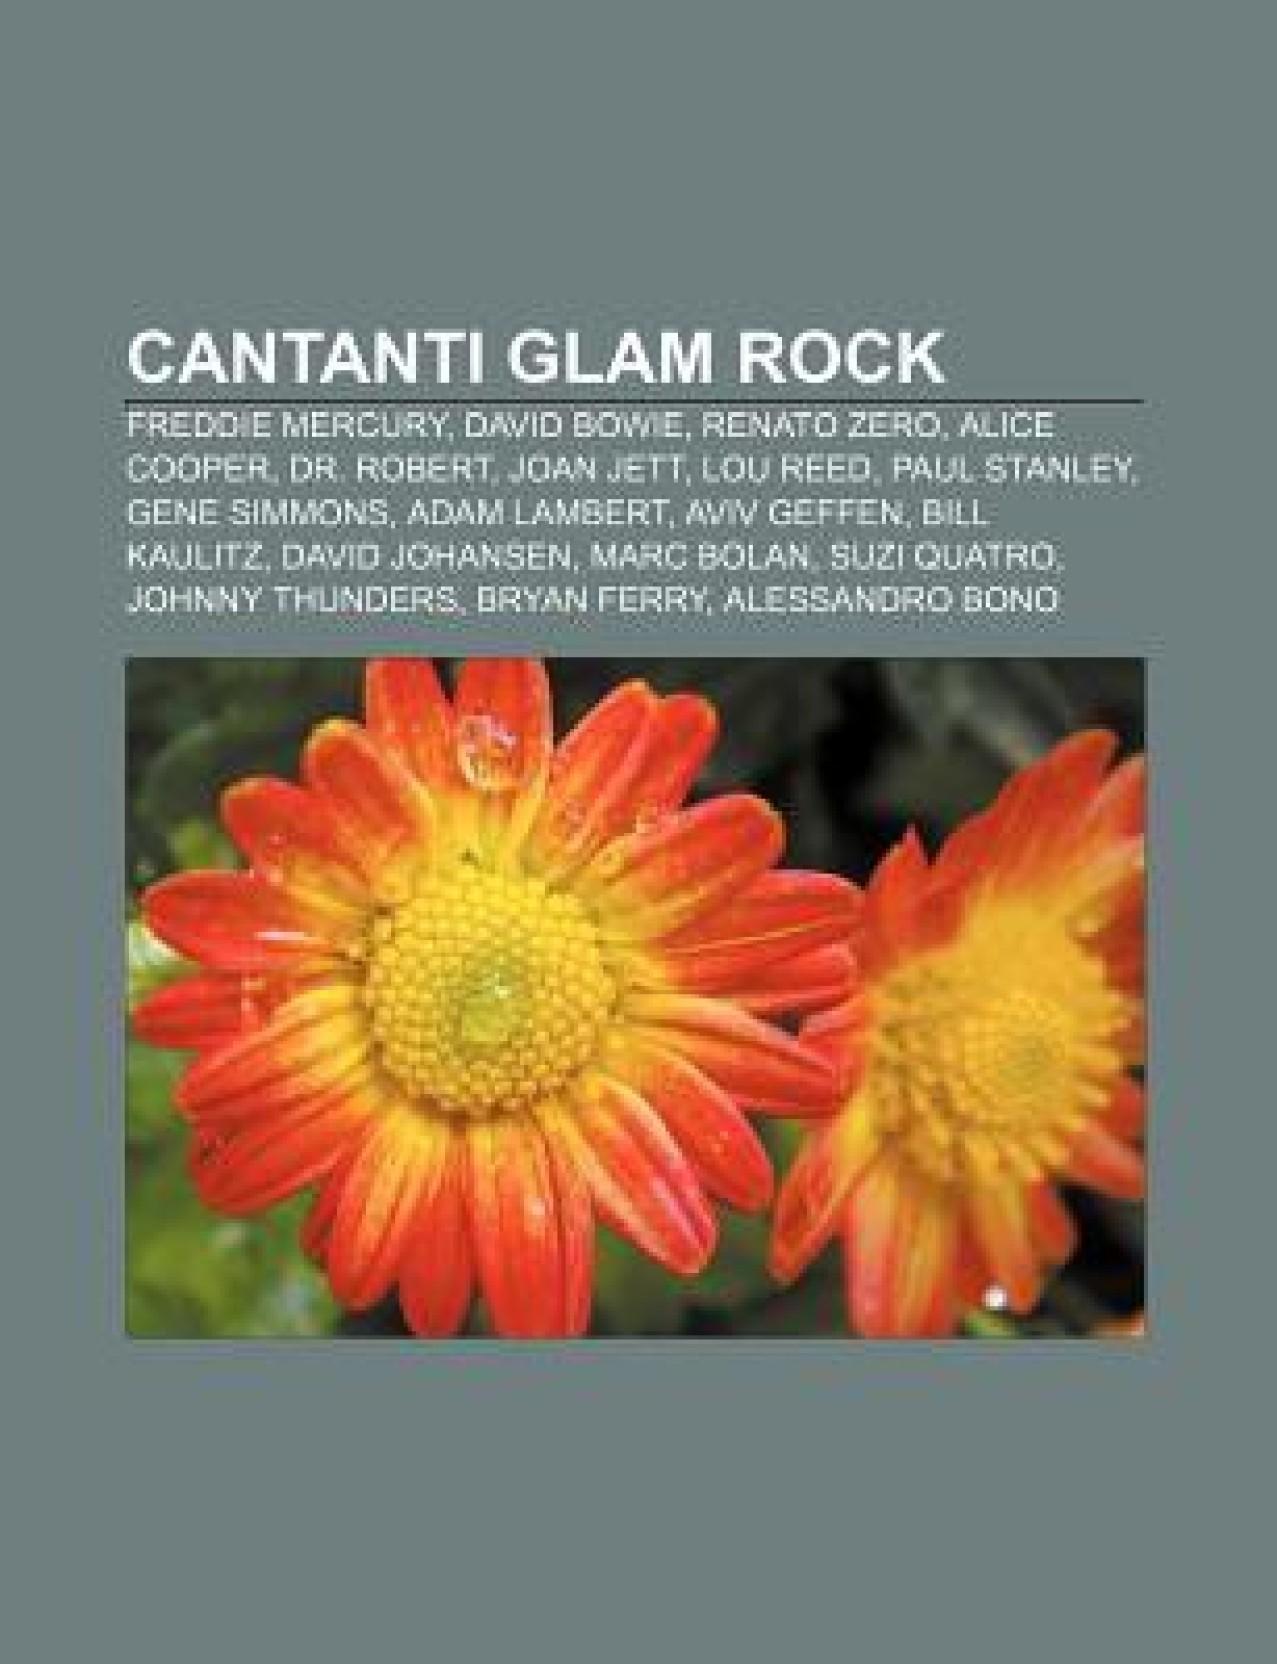 Cantanti glam rock: Freddie Mercury, David Bowie, Renato